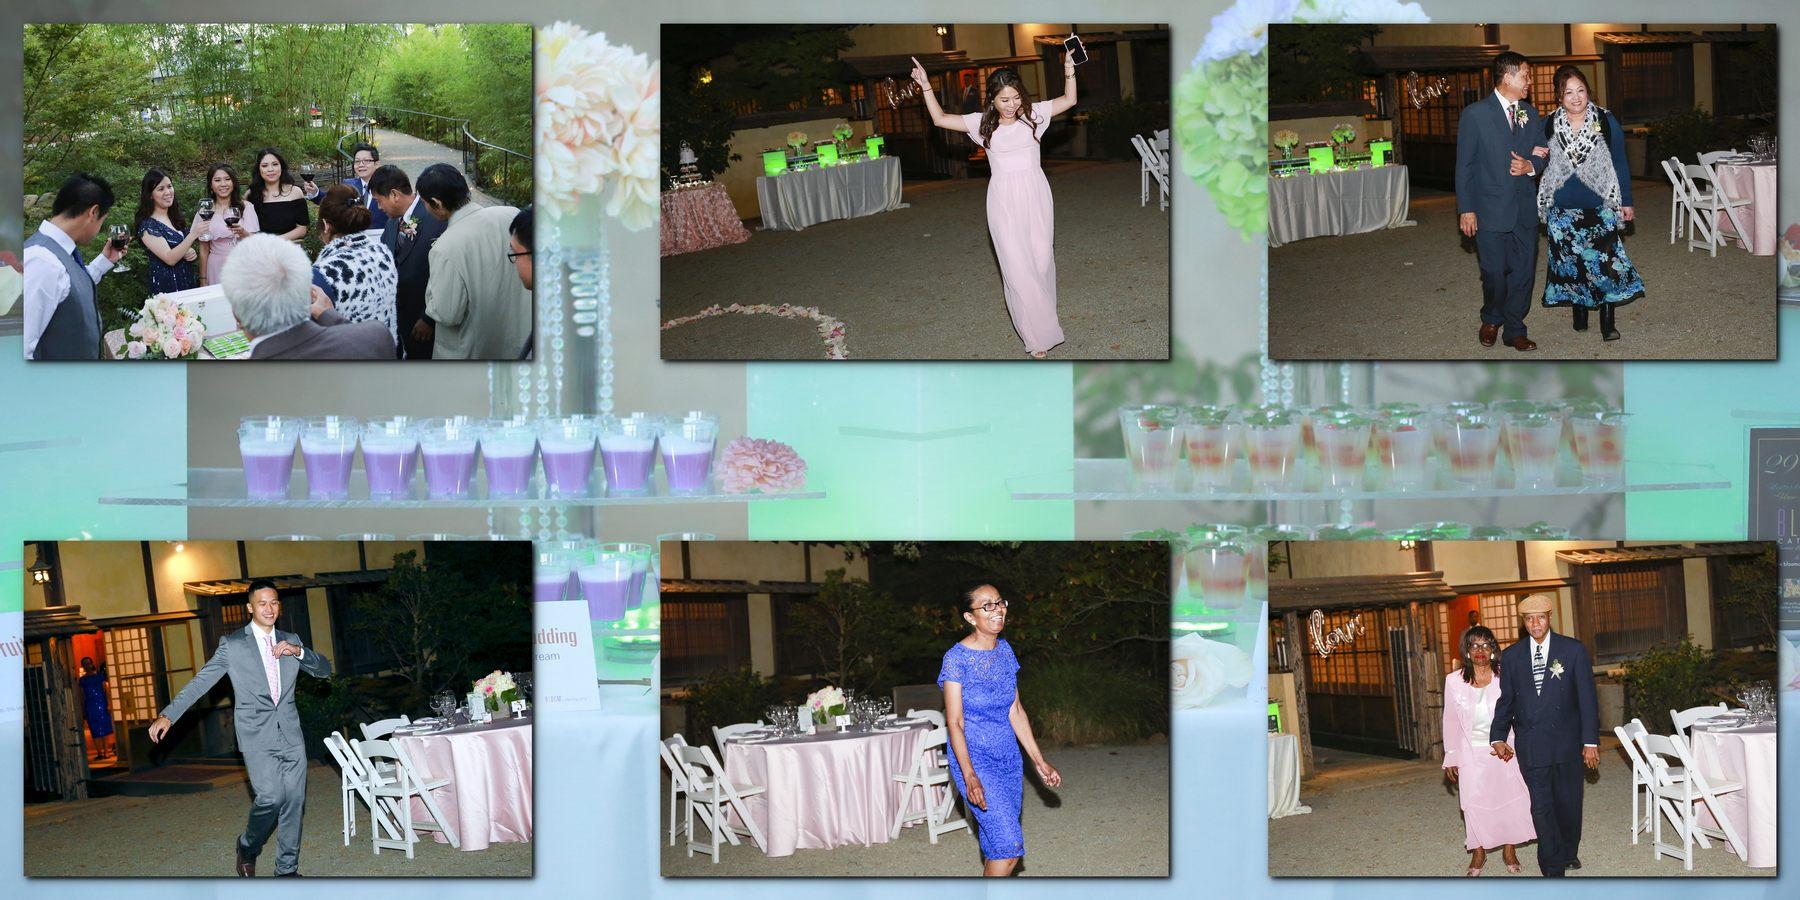 Keneisha wedding album 013 (Sides 24-25)